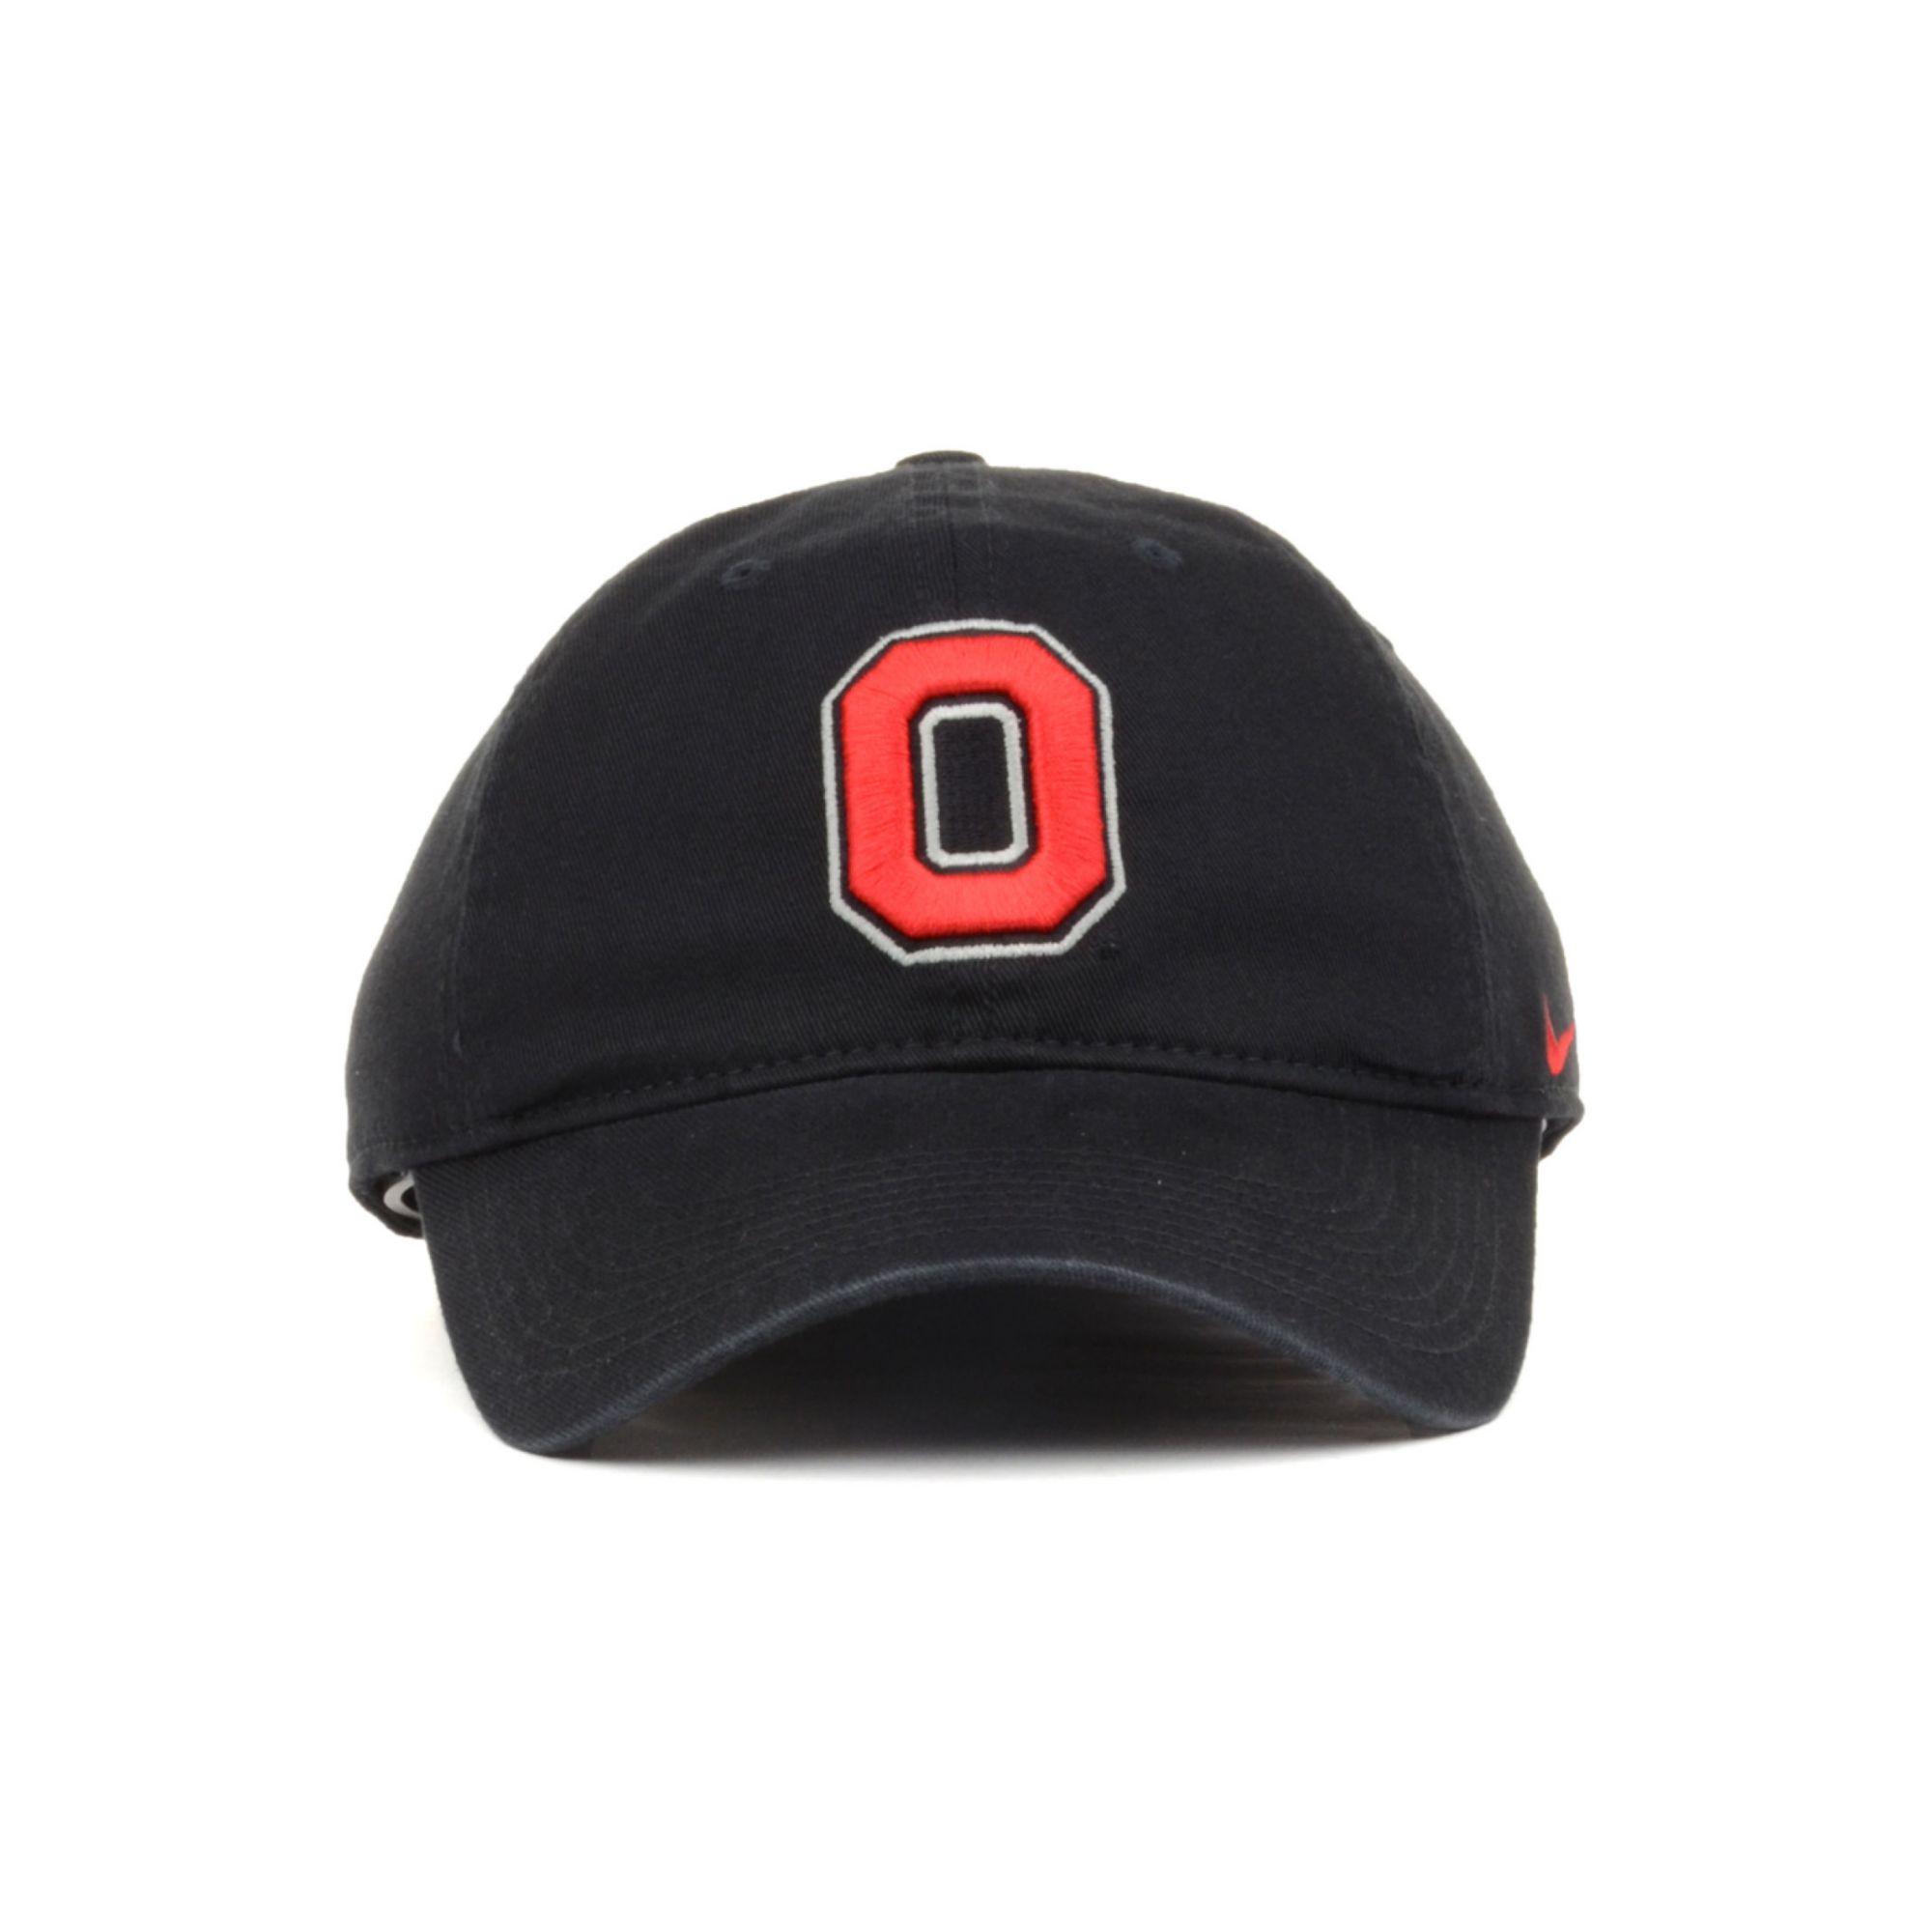 free shipping 91ac5 7a92b ... new arrivals 2017 online 3c37b 1818b nike 2017 ncaa alternate jersey  hook cap hats at ohiostatebuckeyes